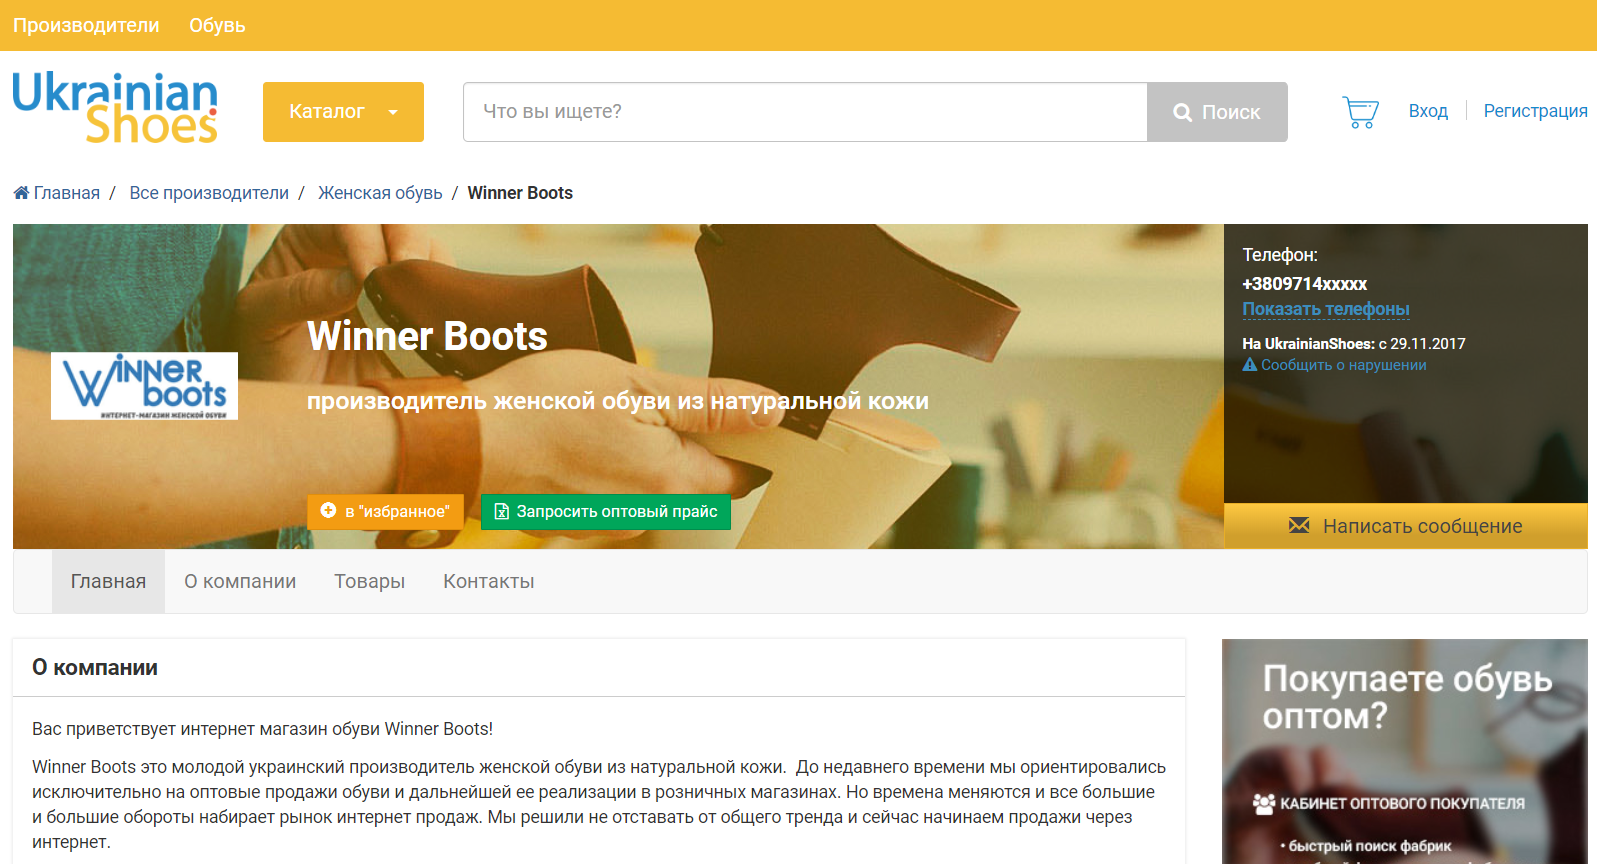 Производитель обуви Winner Boots